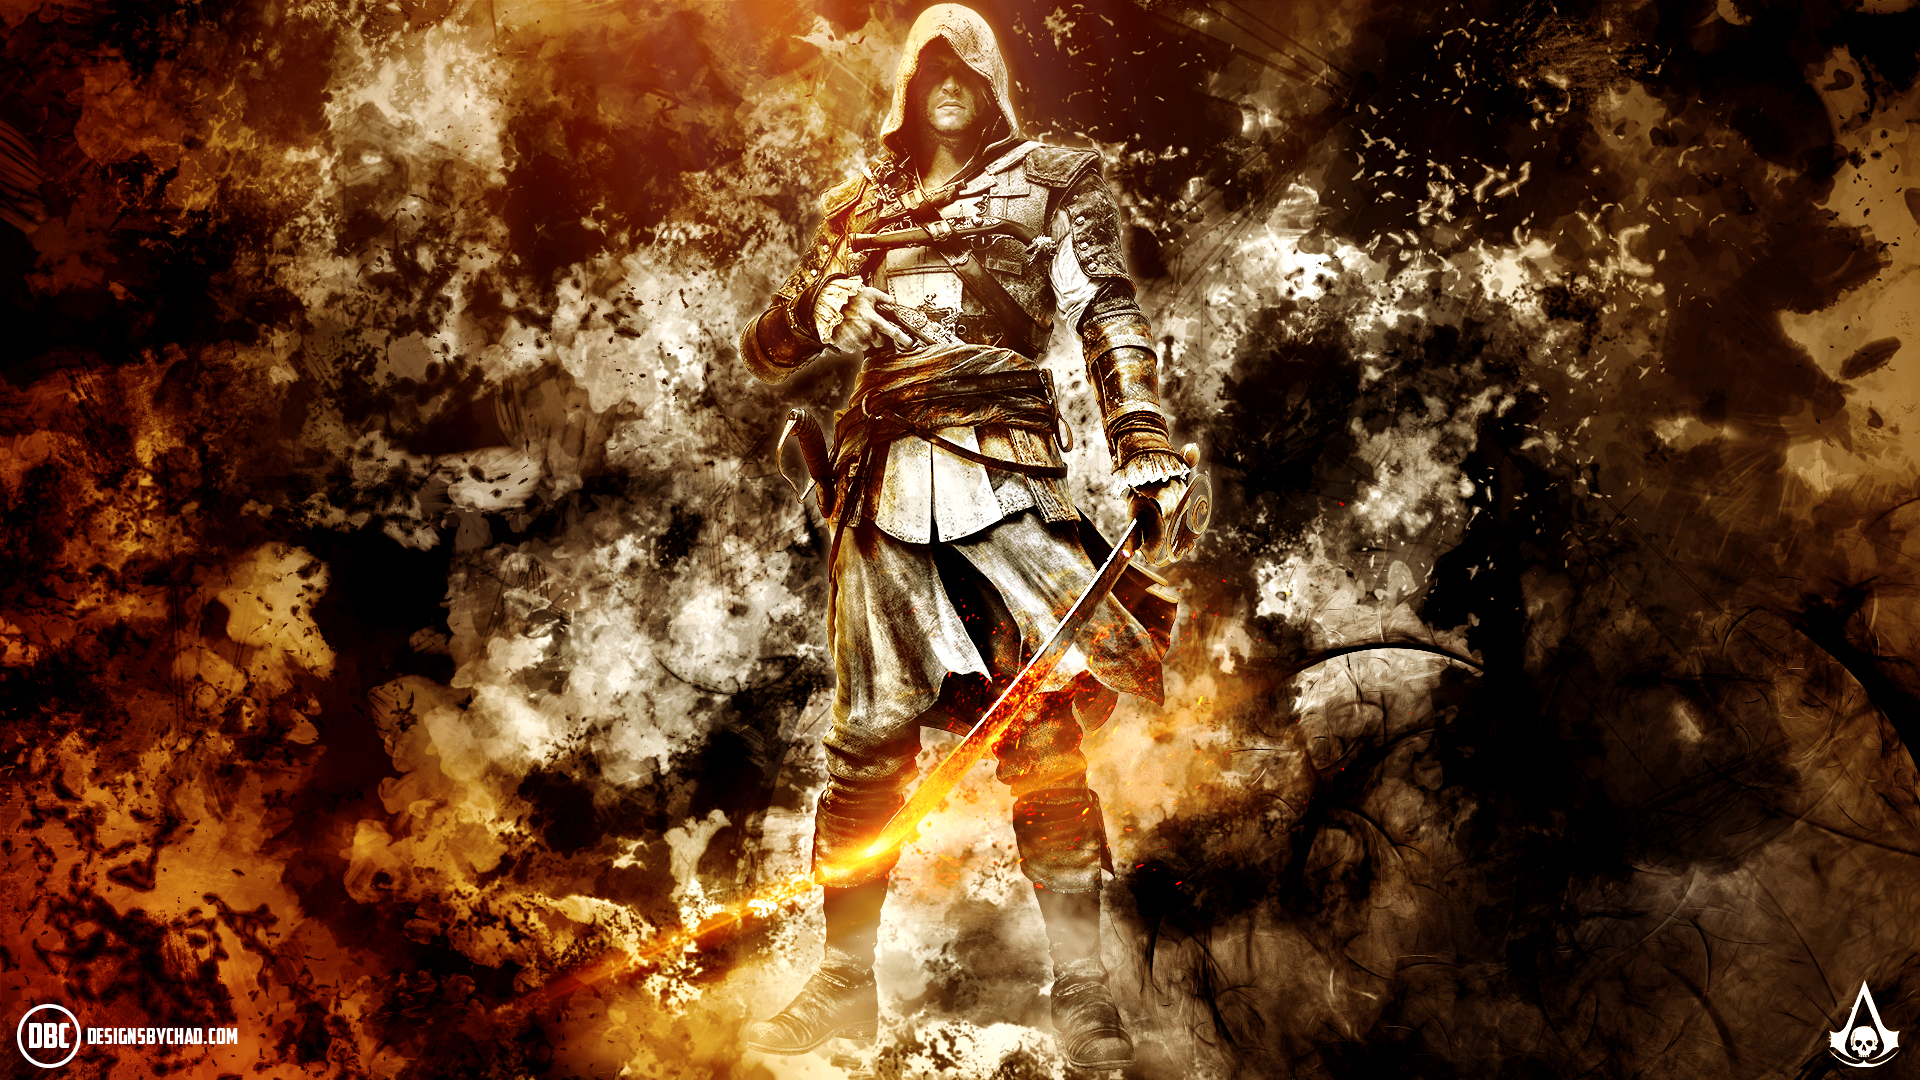 Assassin's Creed Black Flag Wallpaper by Chadski51